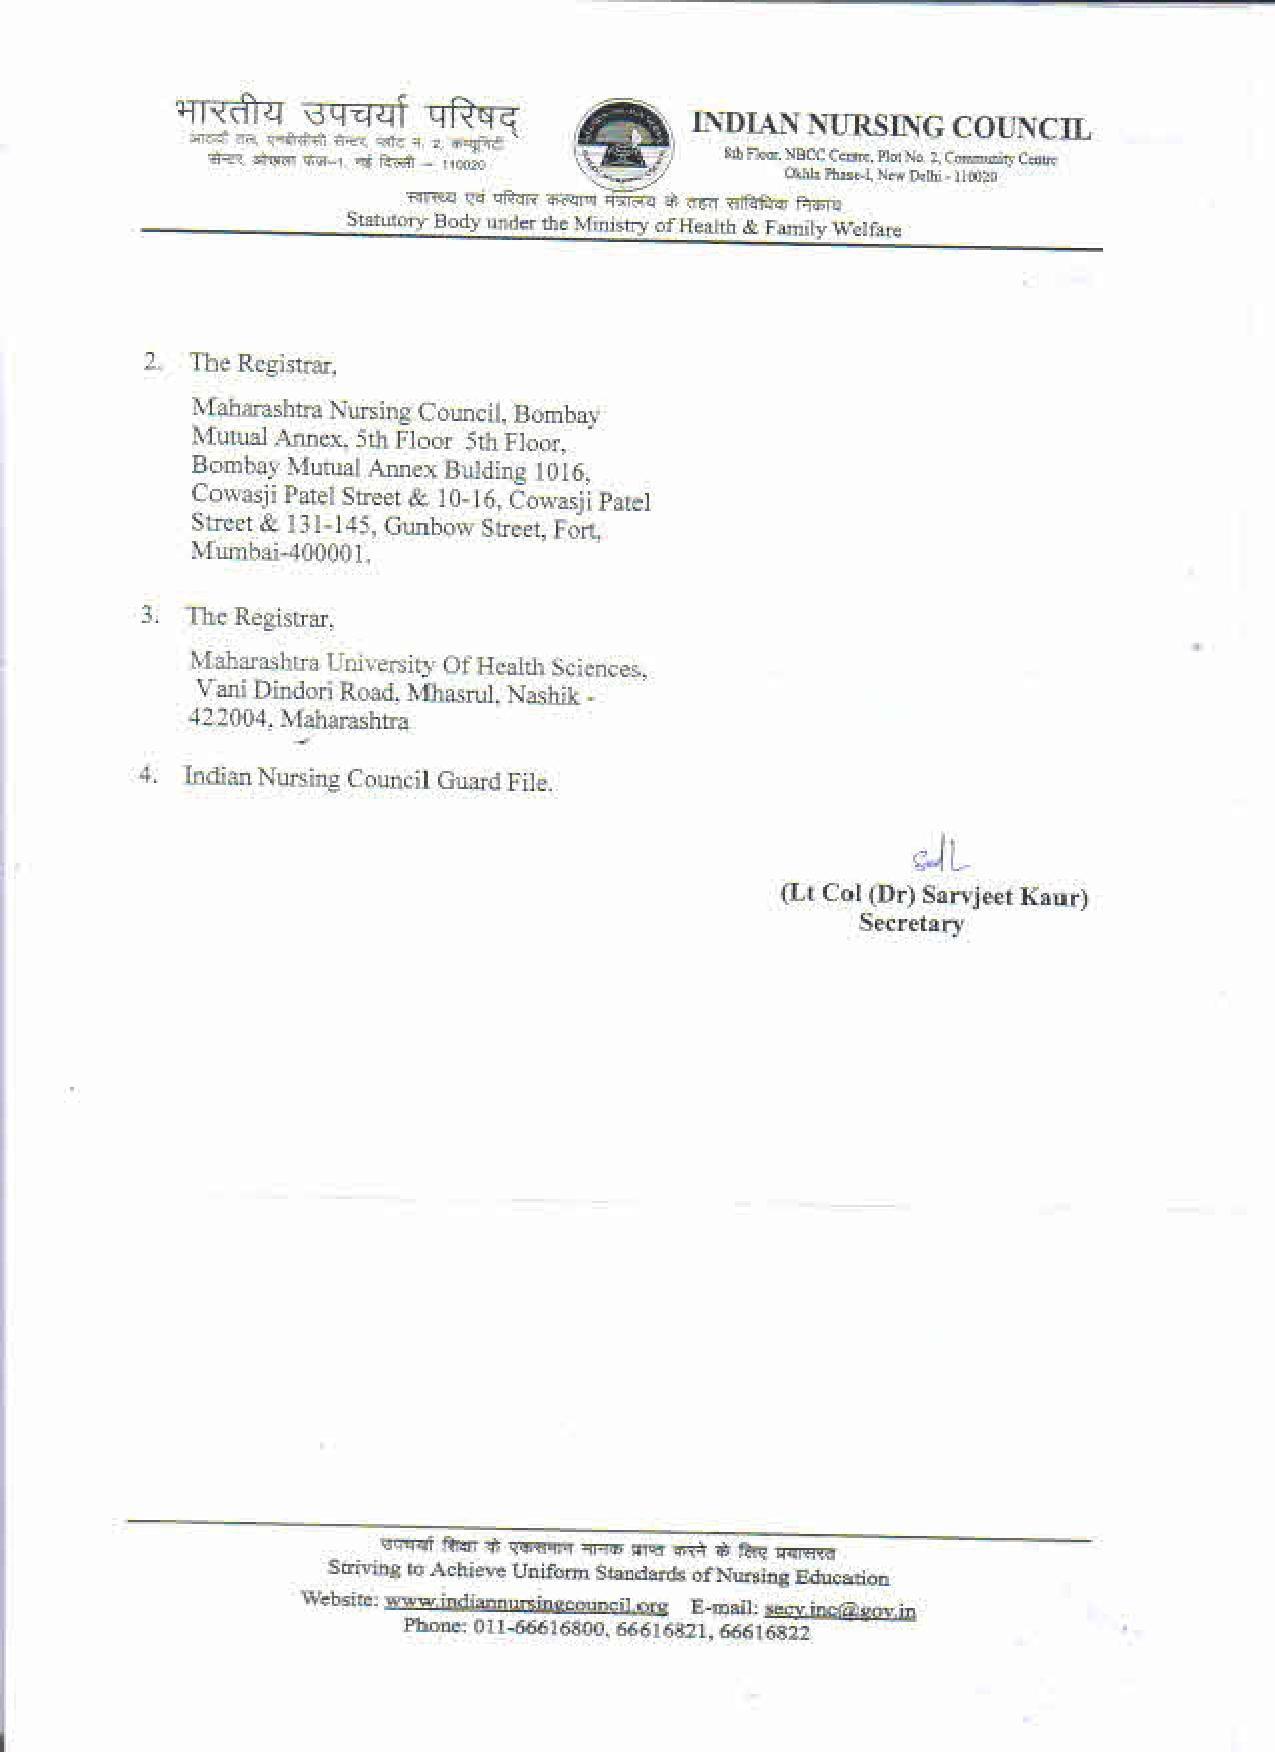 INC Permission letter_2&n